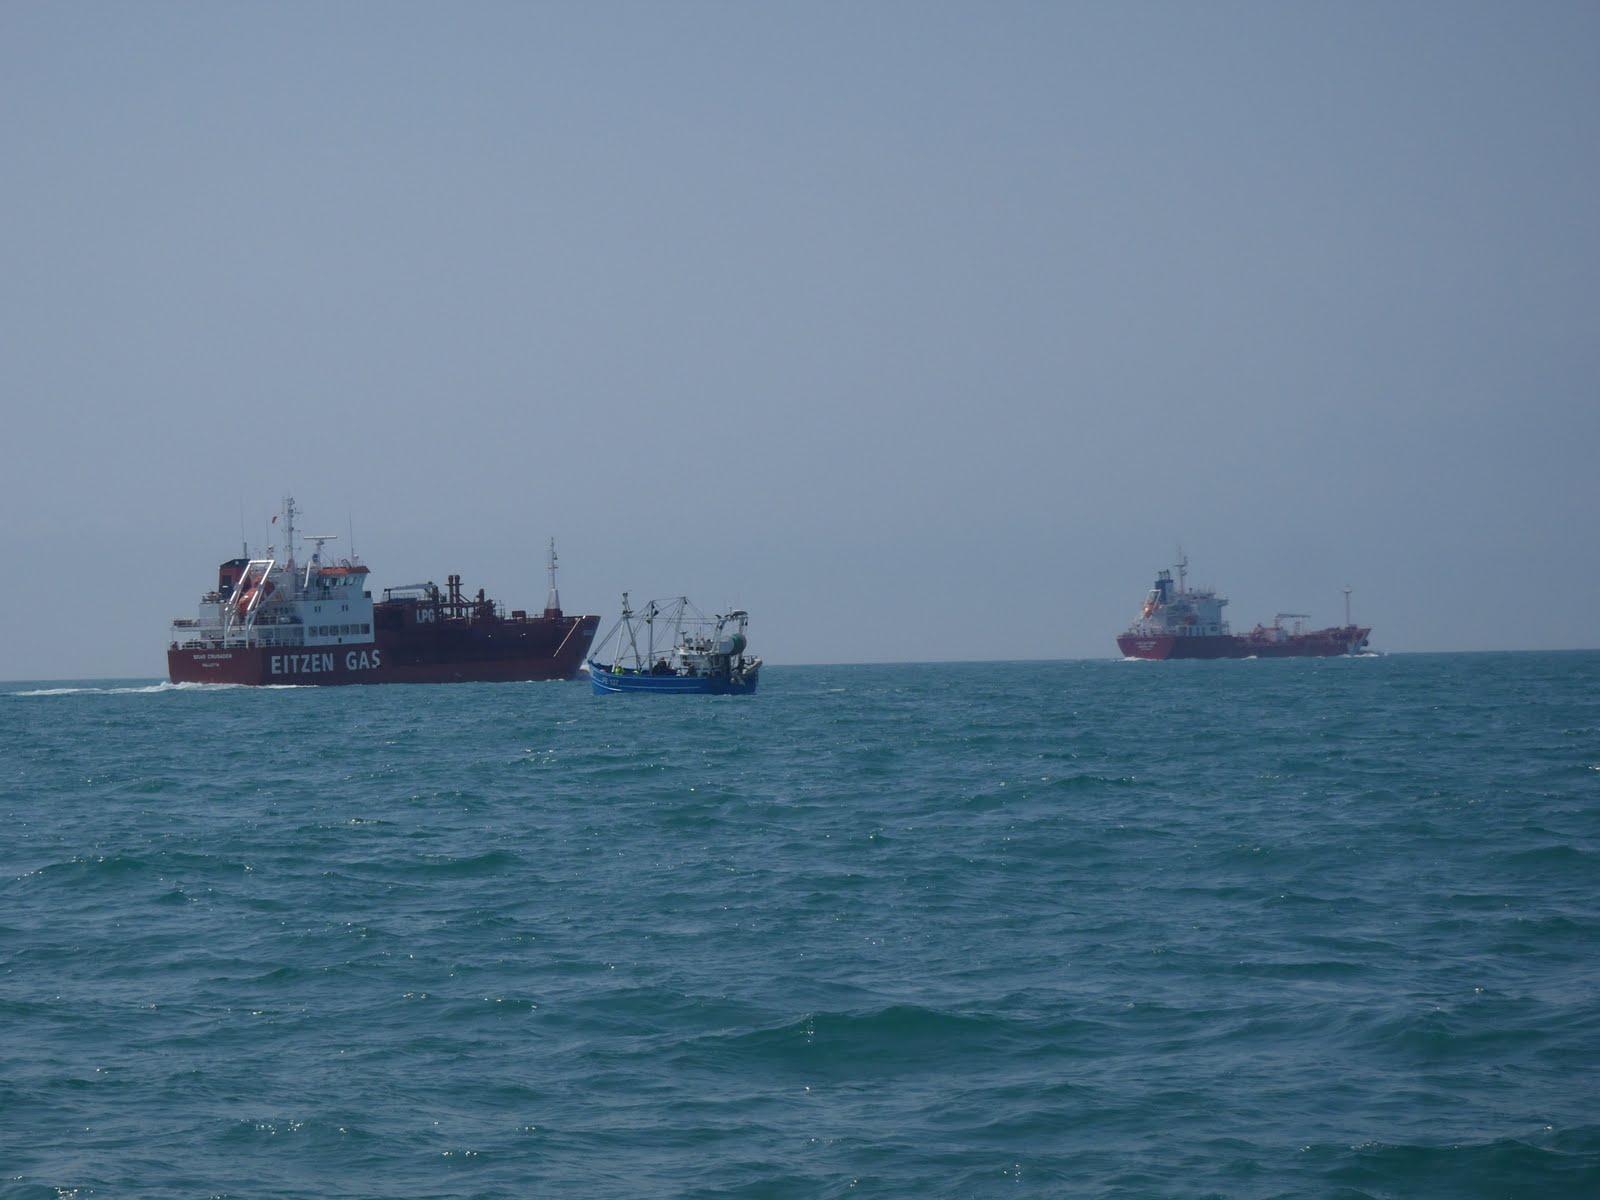 Among the many boats out today, I see Viking Princess ahead.